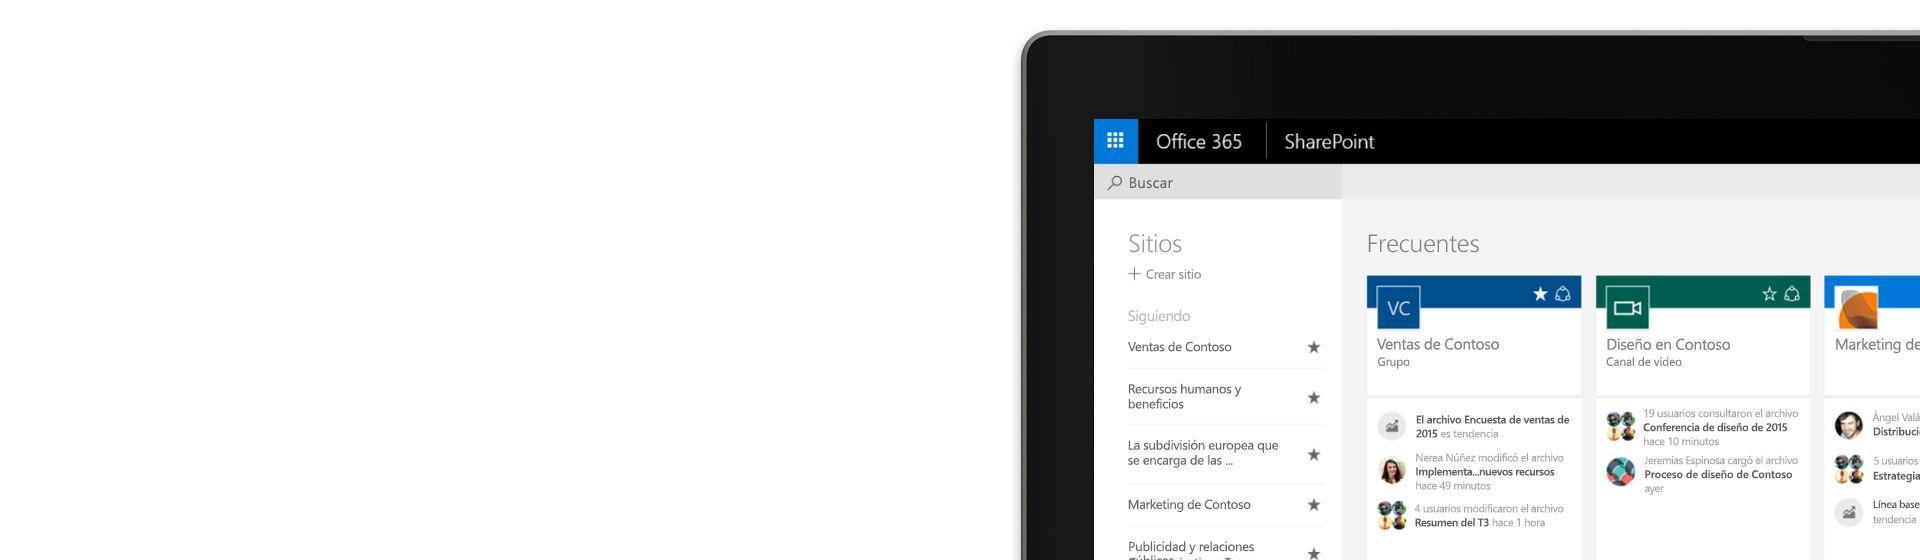 Esquina de la pantalla de un portátil donde se muestra SharePoint de Office 365 para Contoso